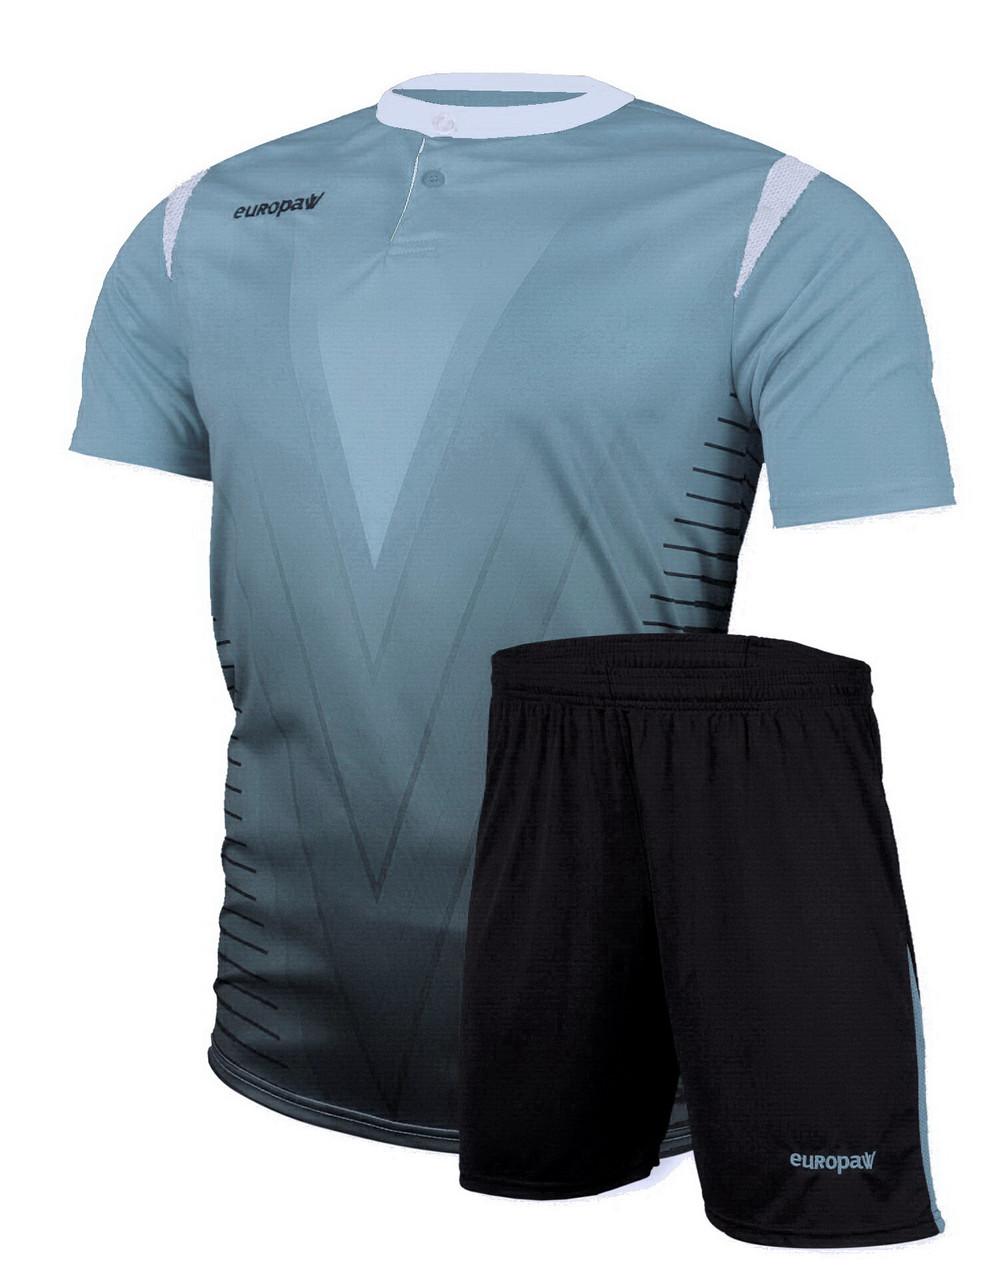 Футбольная форма Europaw 011 голубая